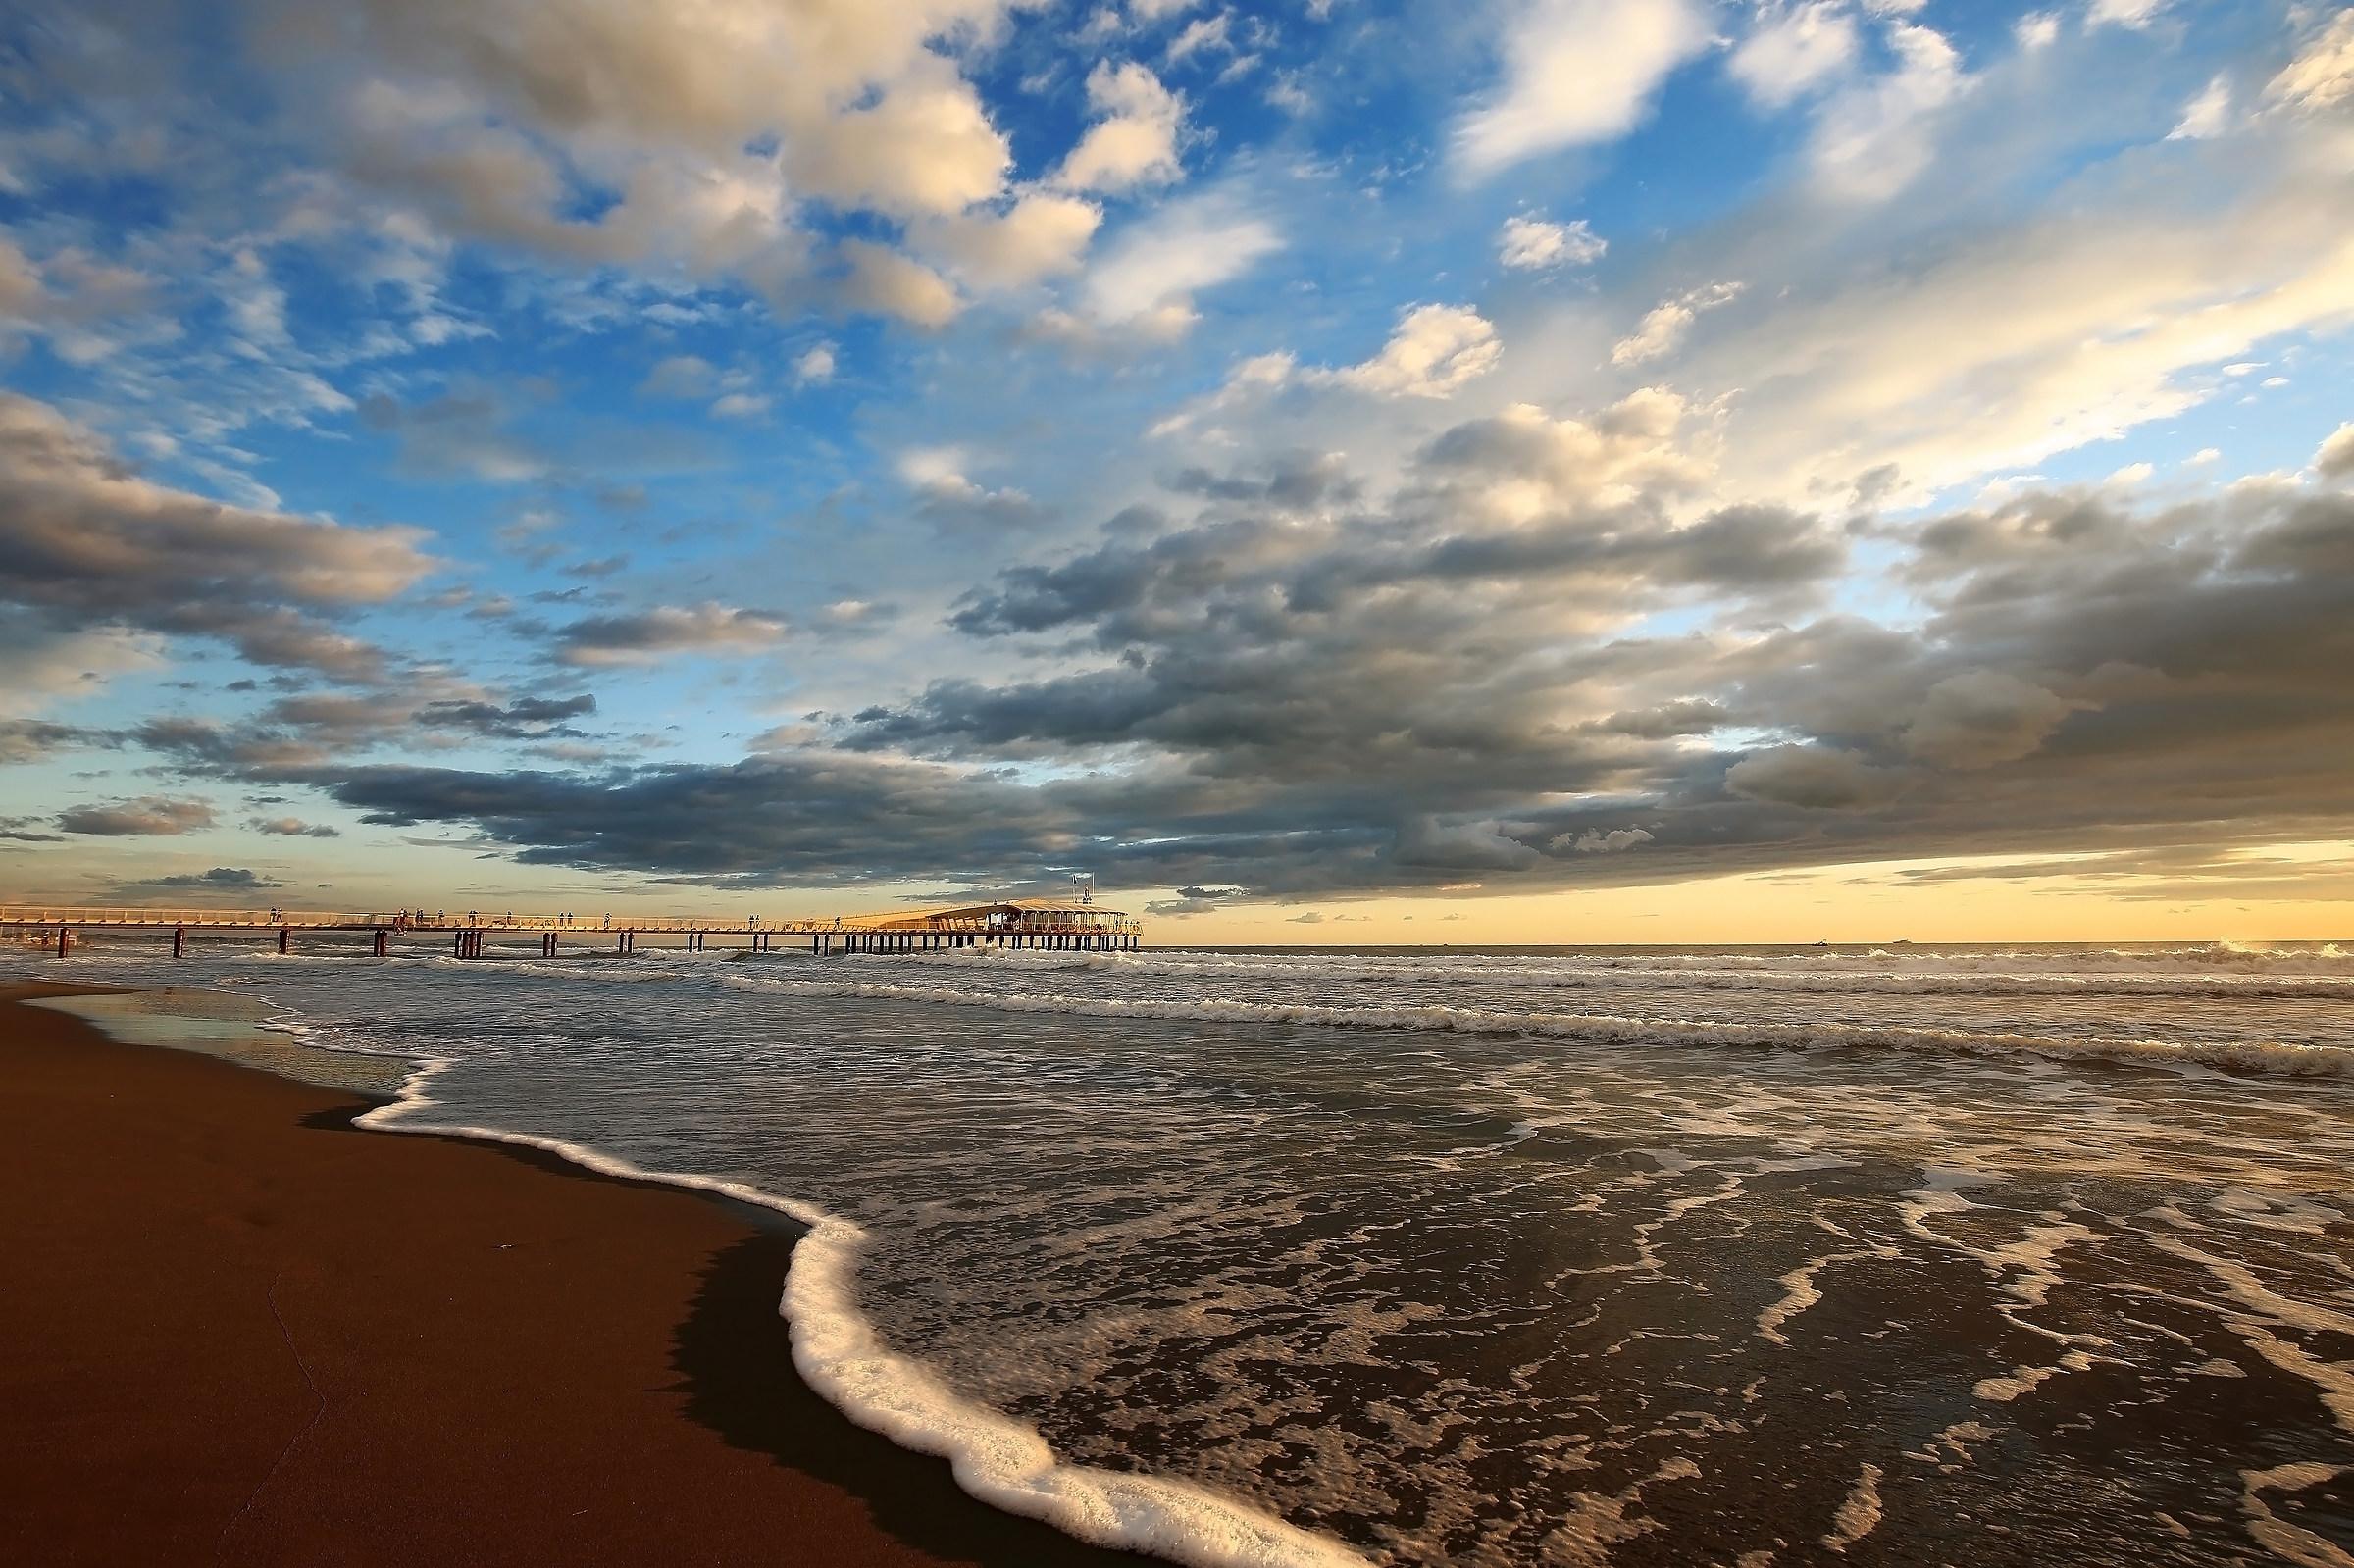 A walk along the beach...